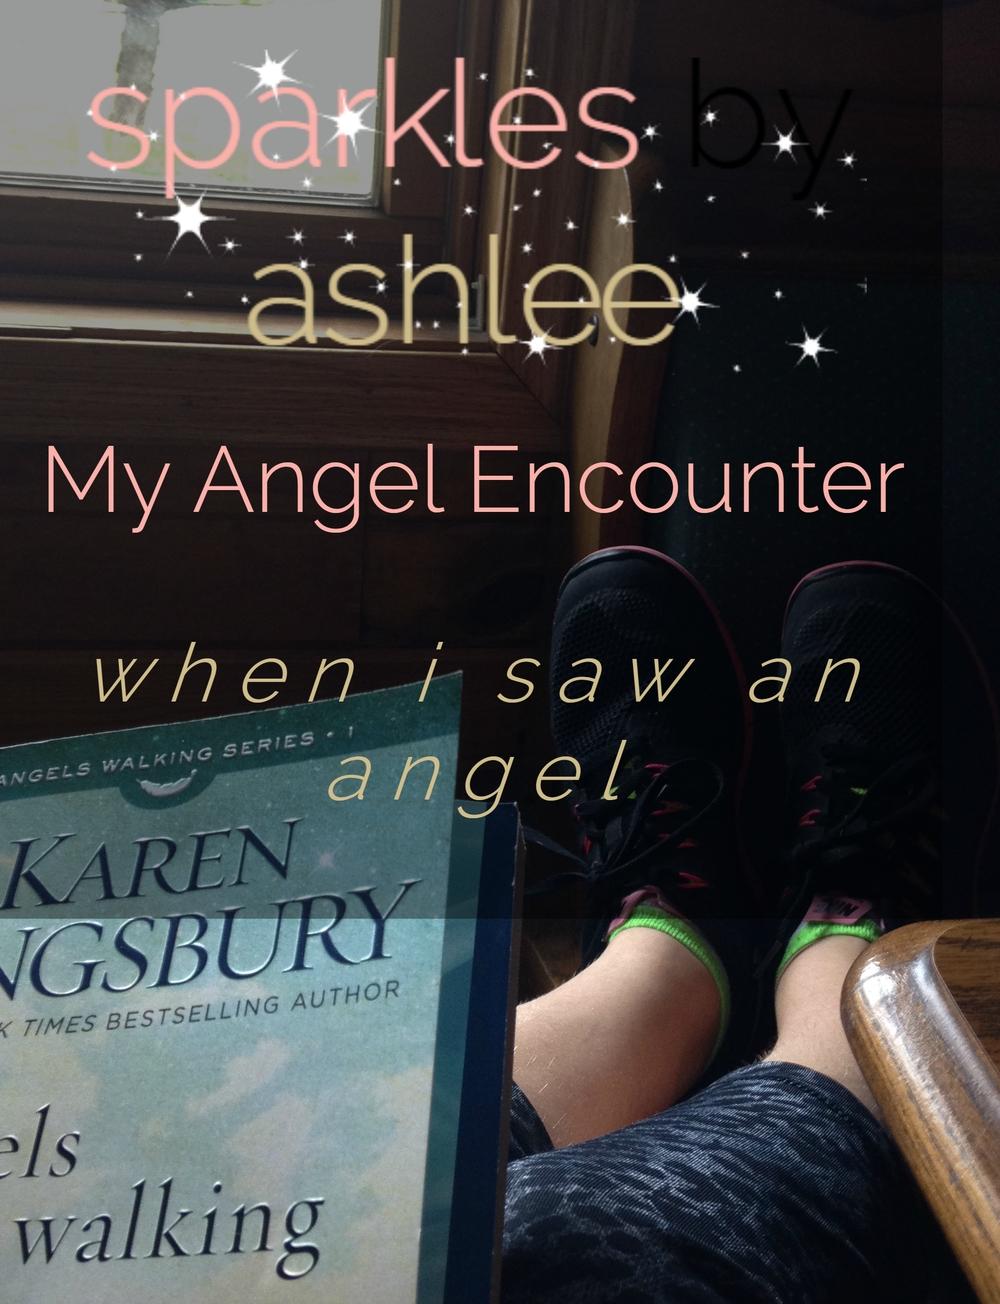 My-Angel-Encounter-Sparkles-by-Ashlee.jpg